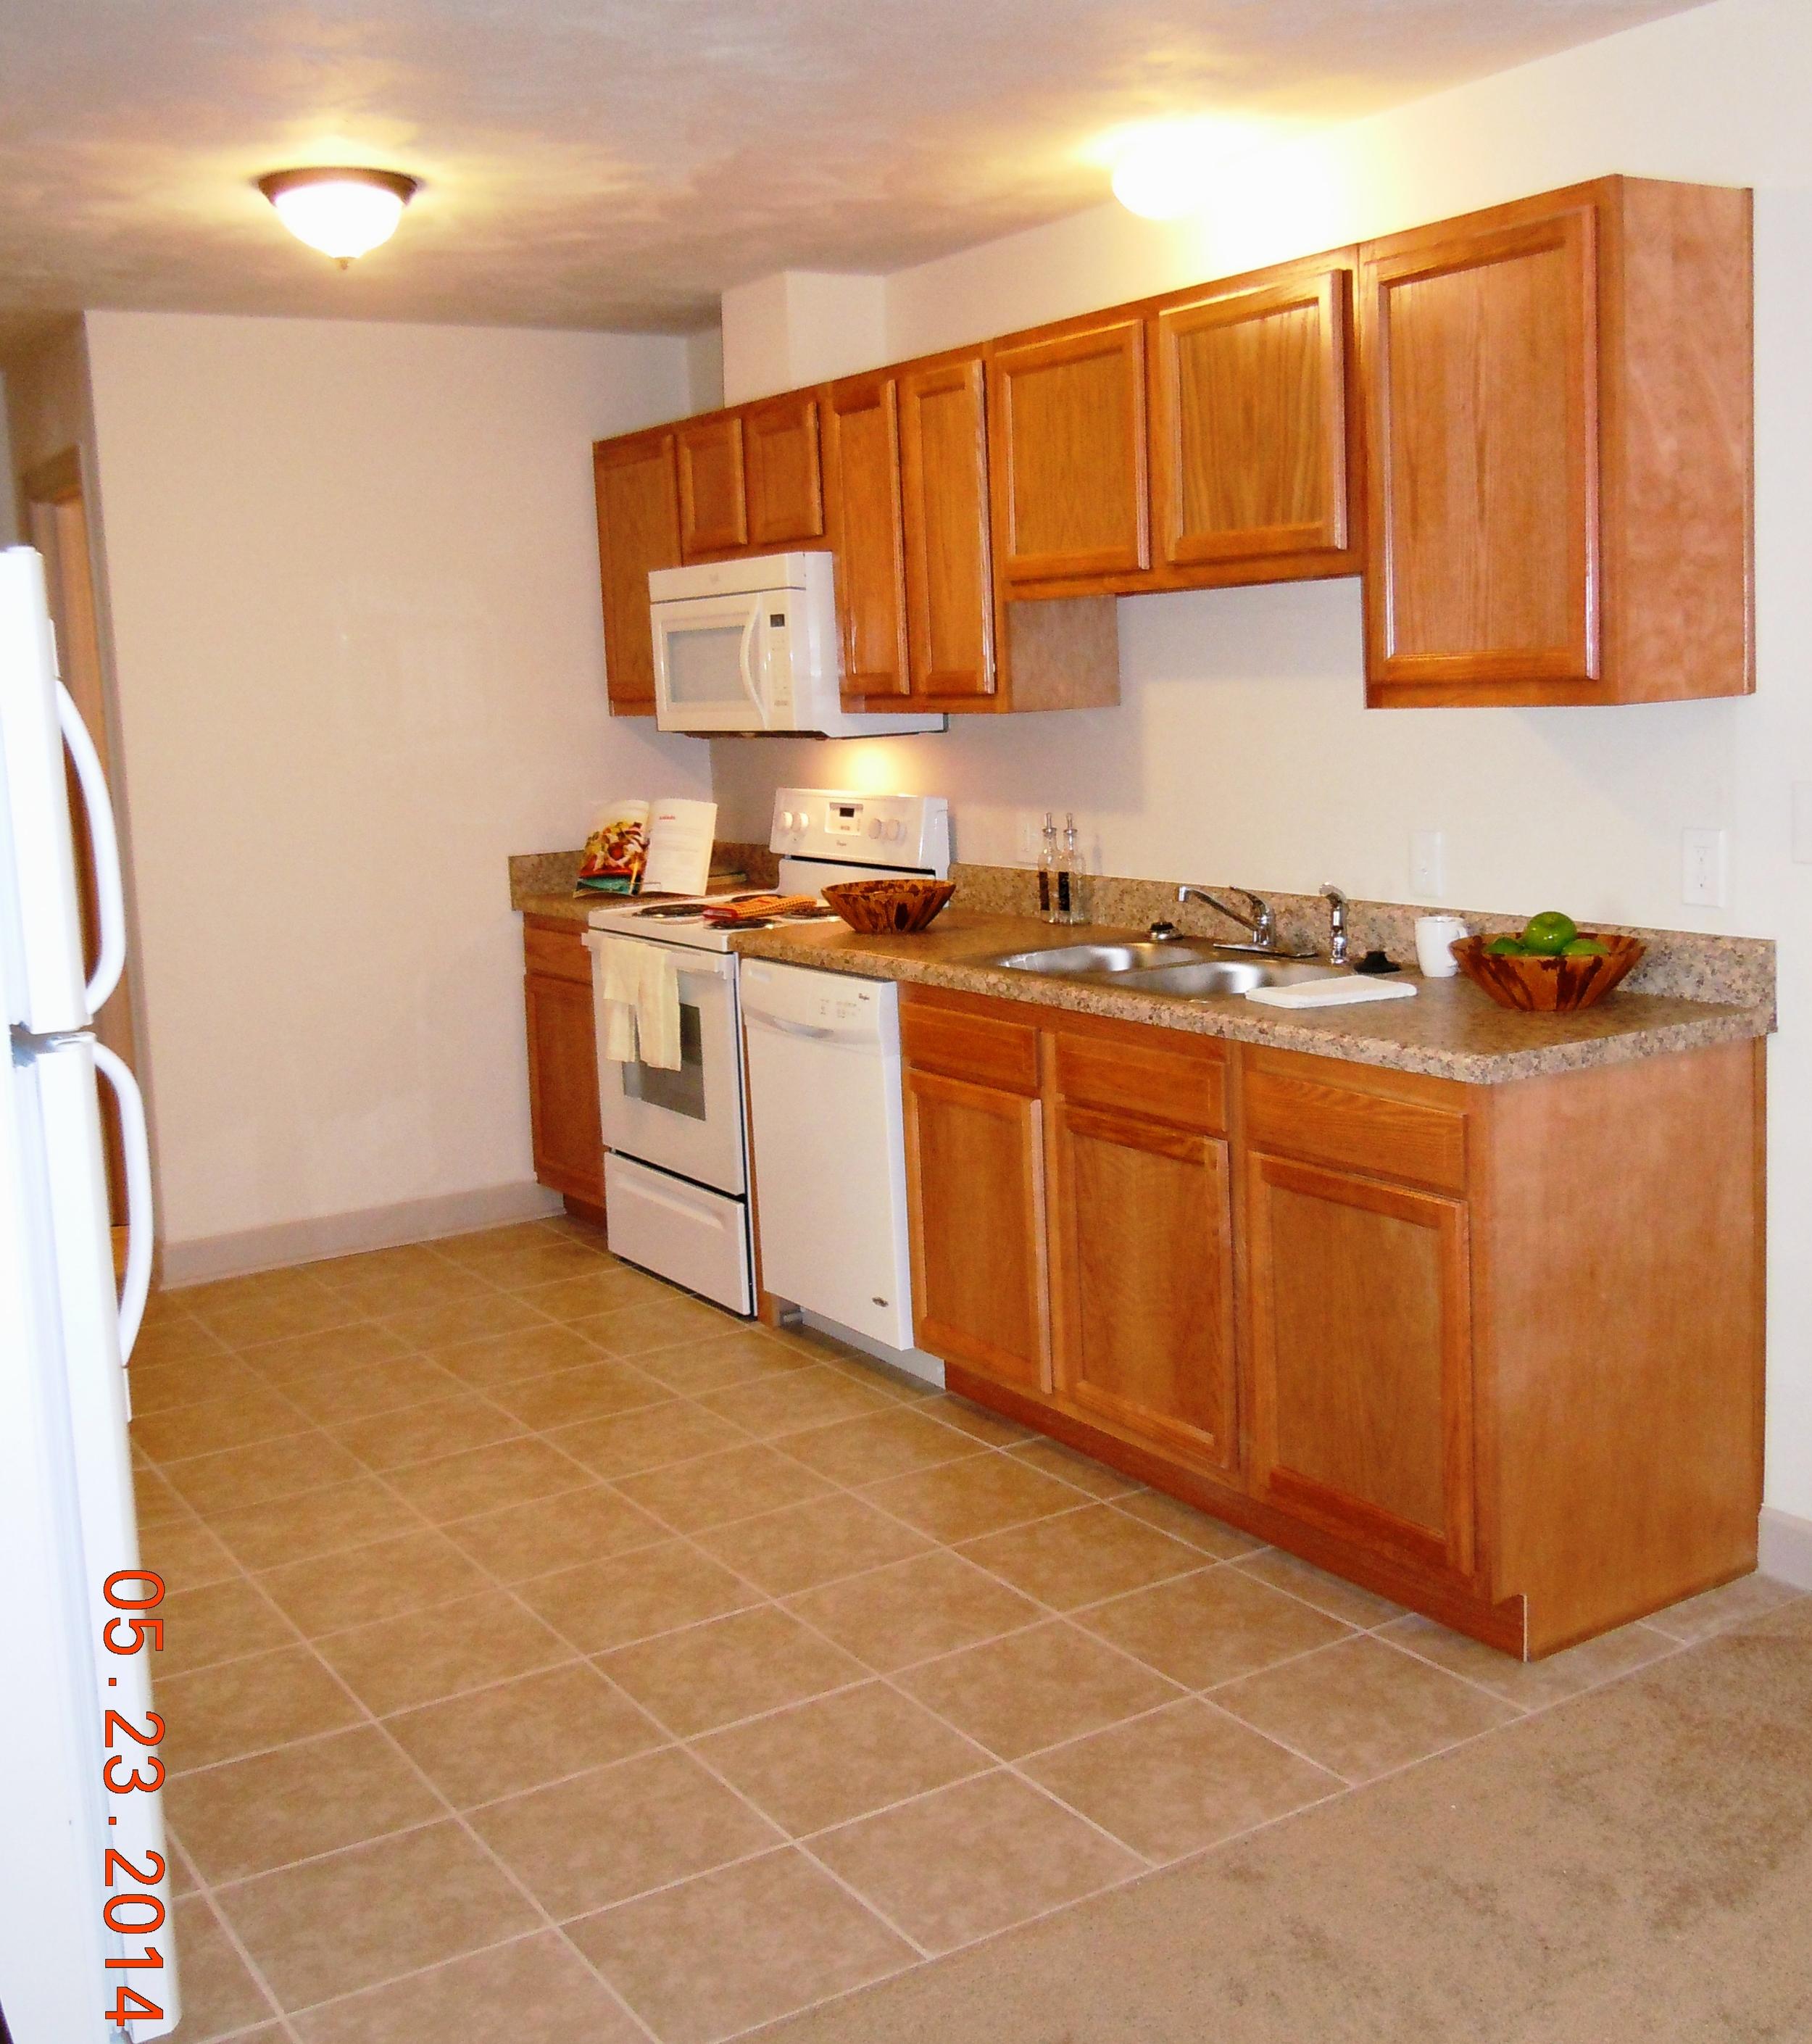 Apartment Guide Pictures (Dodi) 008.jpg